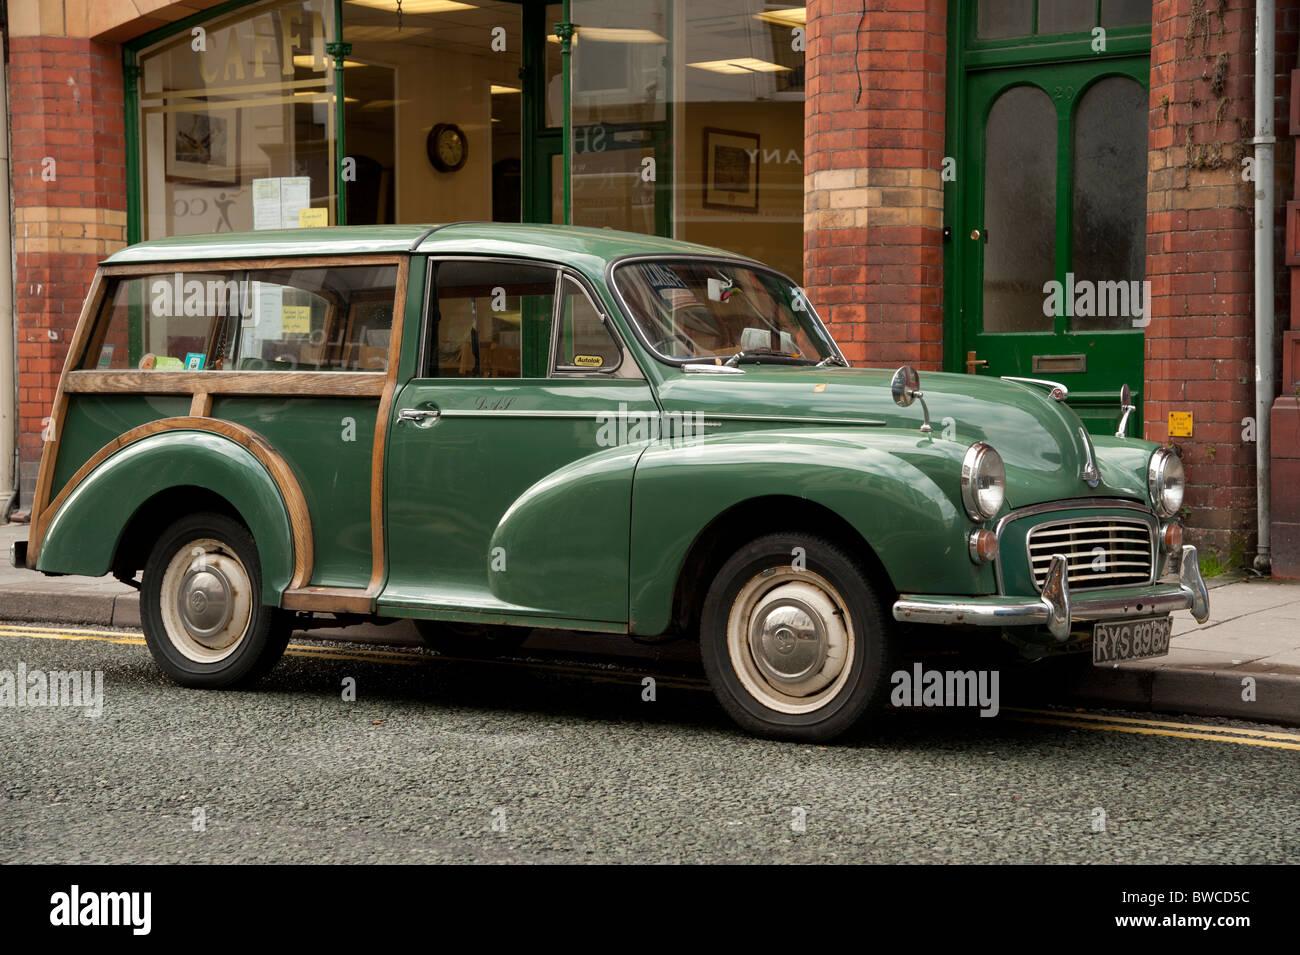 morris minor 1000 traveller classic british estate car uk. Black Bedroom Furniture Sets. Home Design Ideas